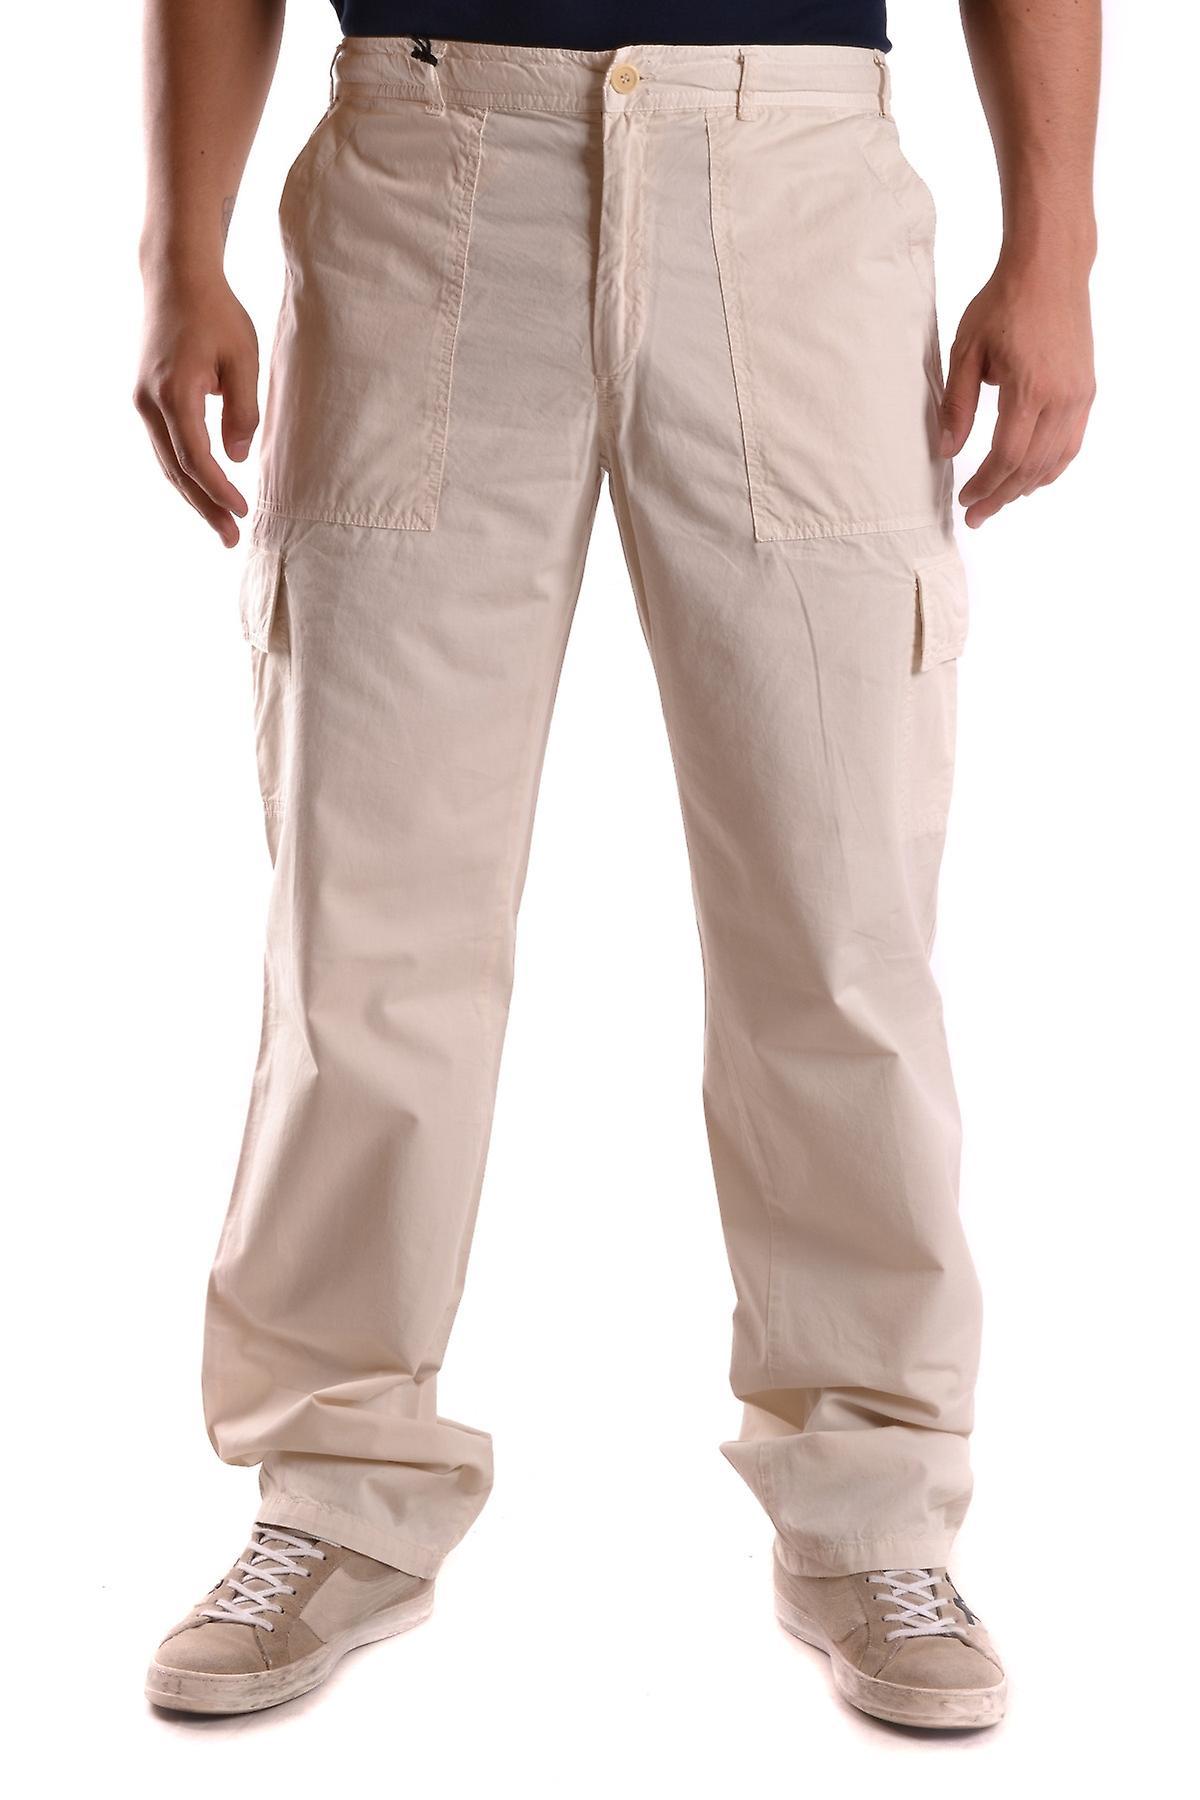 low priced 4e314 cbc89 Alberto Aspesi Beige Cotton Pants